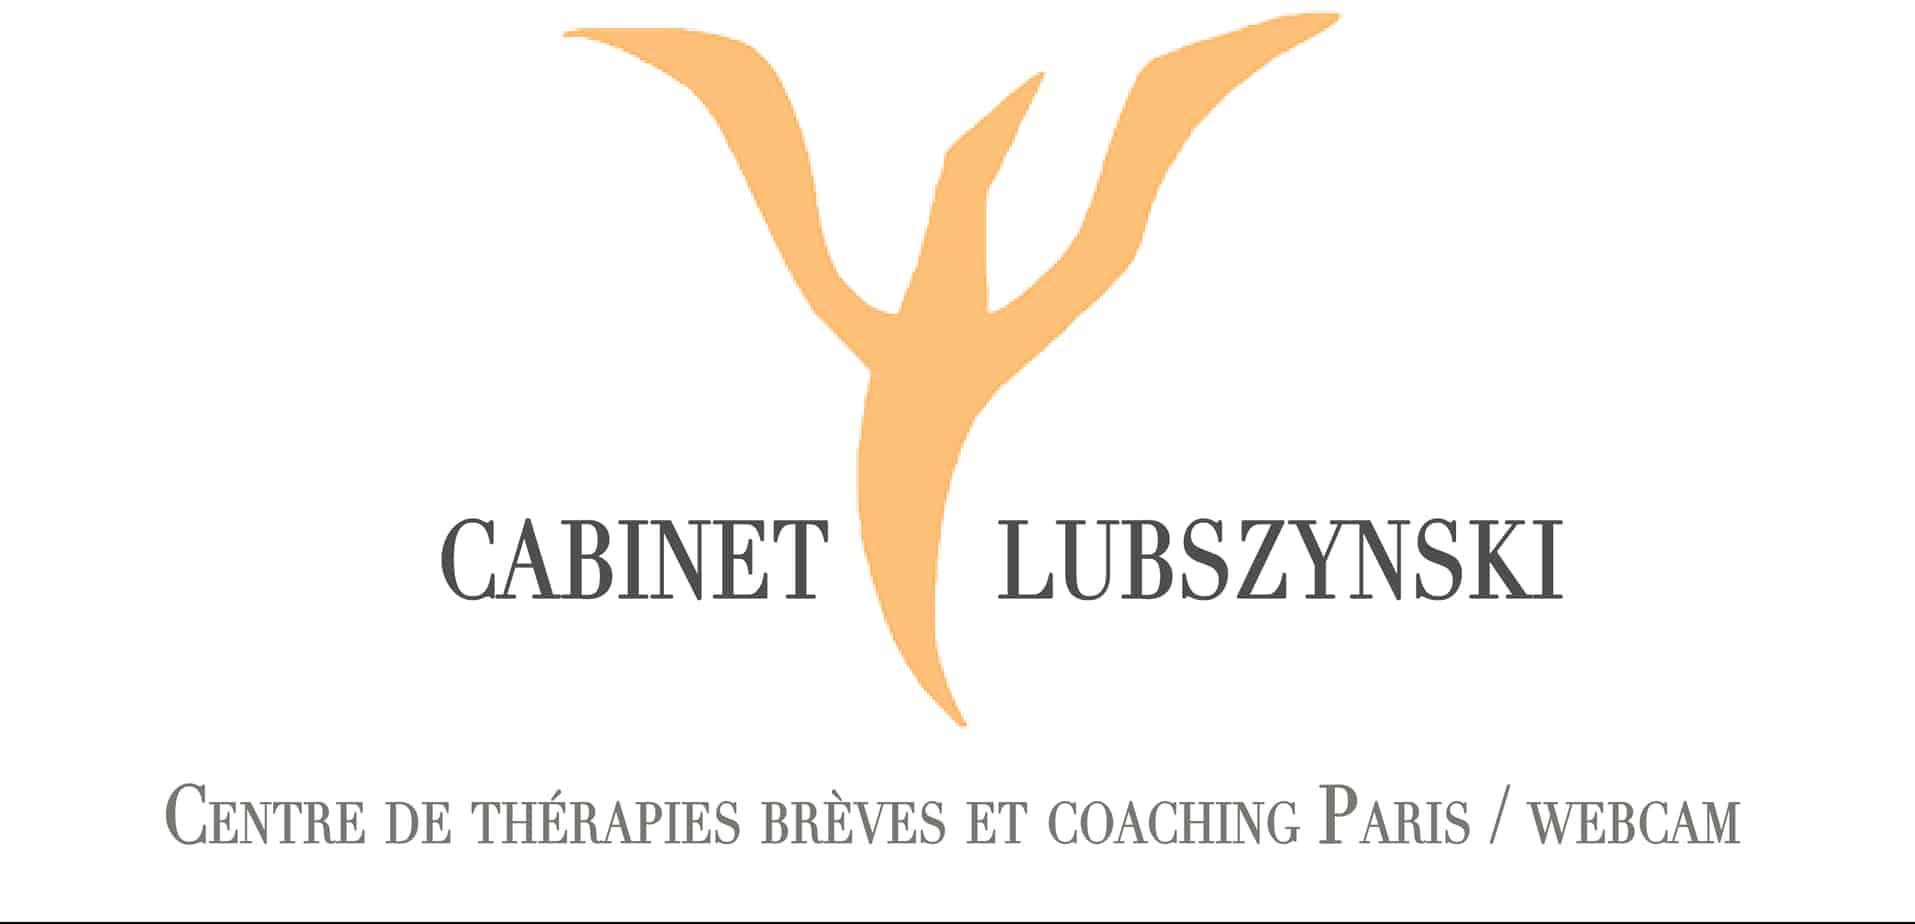 Cabinet Lubszynski